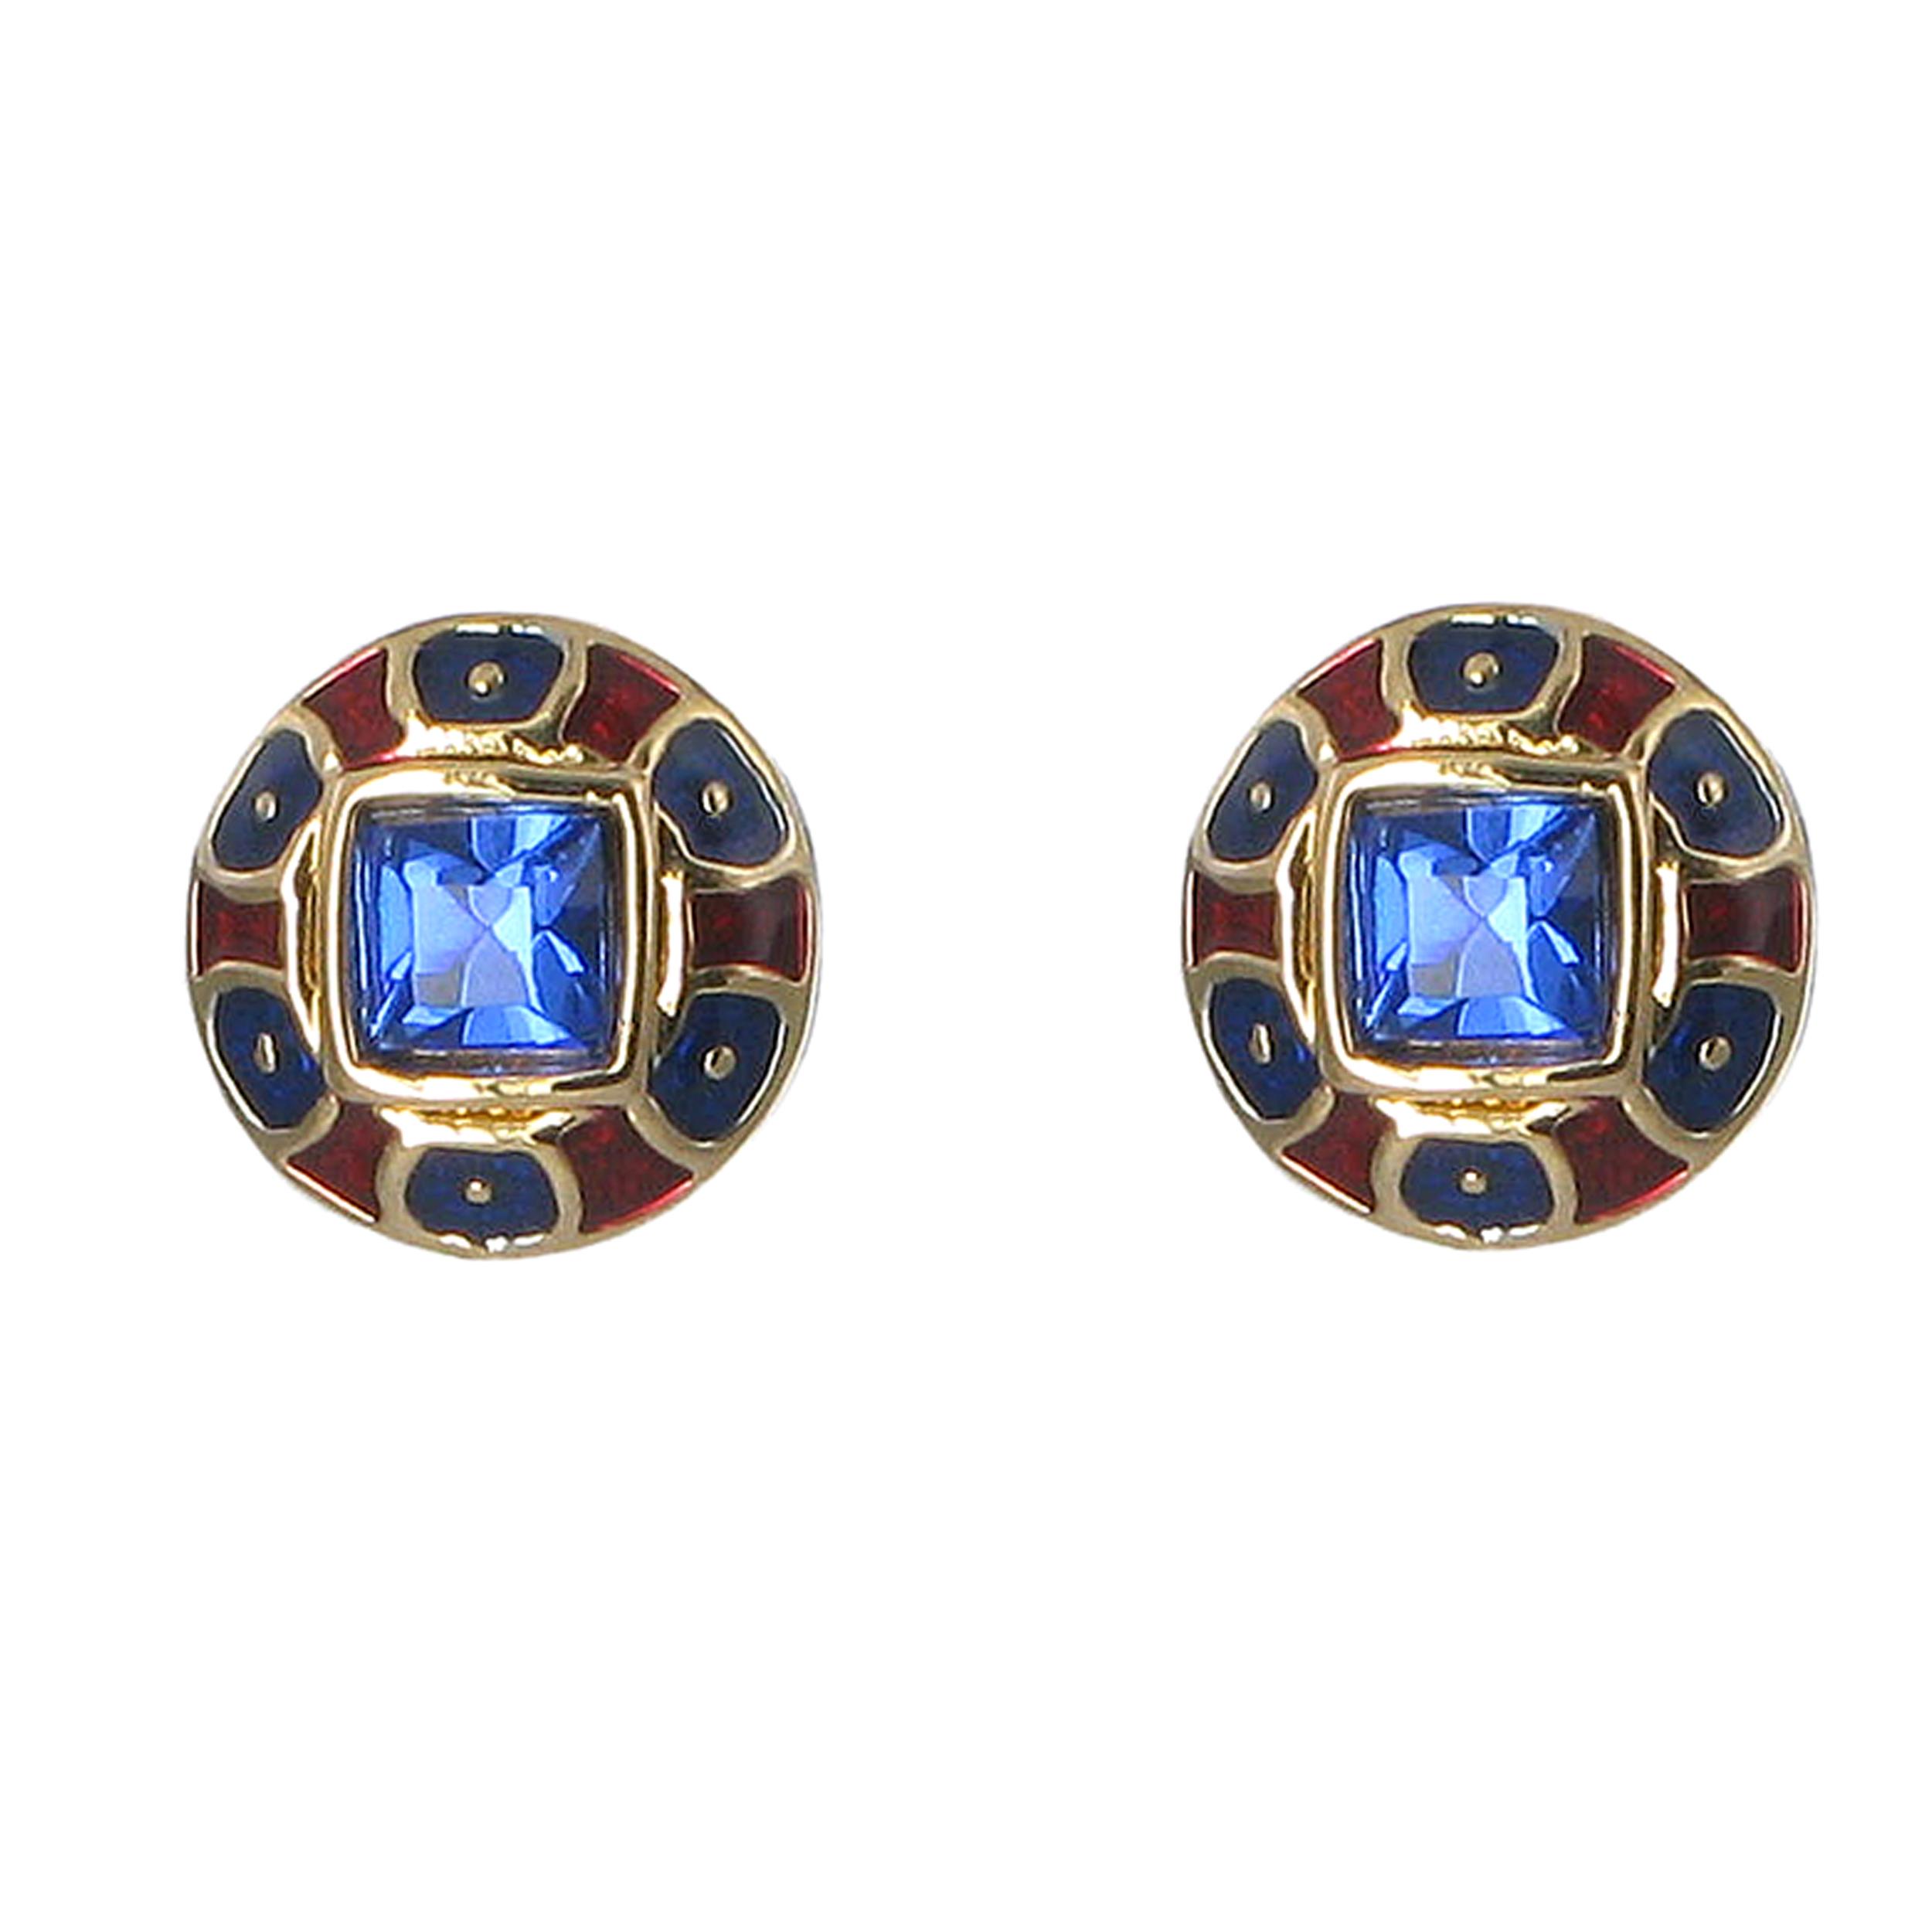 Grenville stud earrings